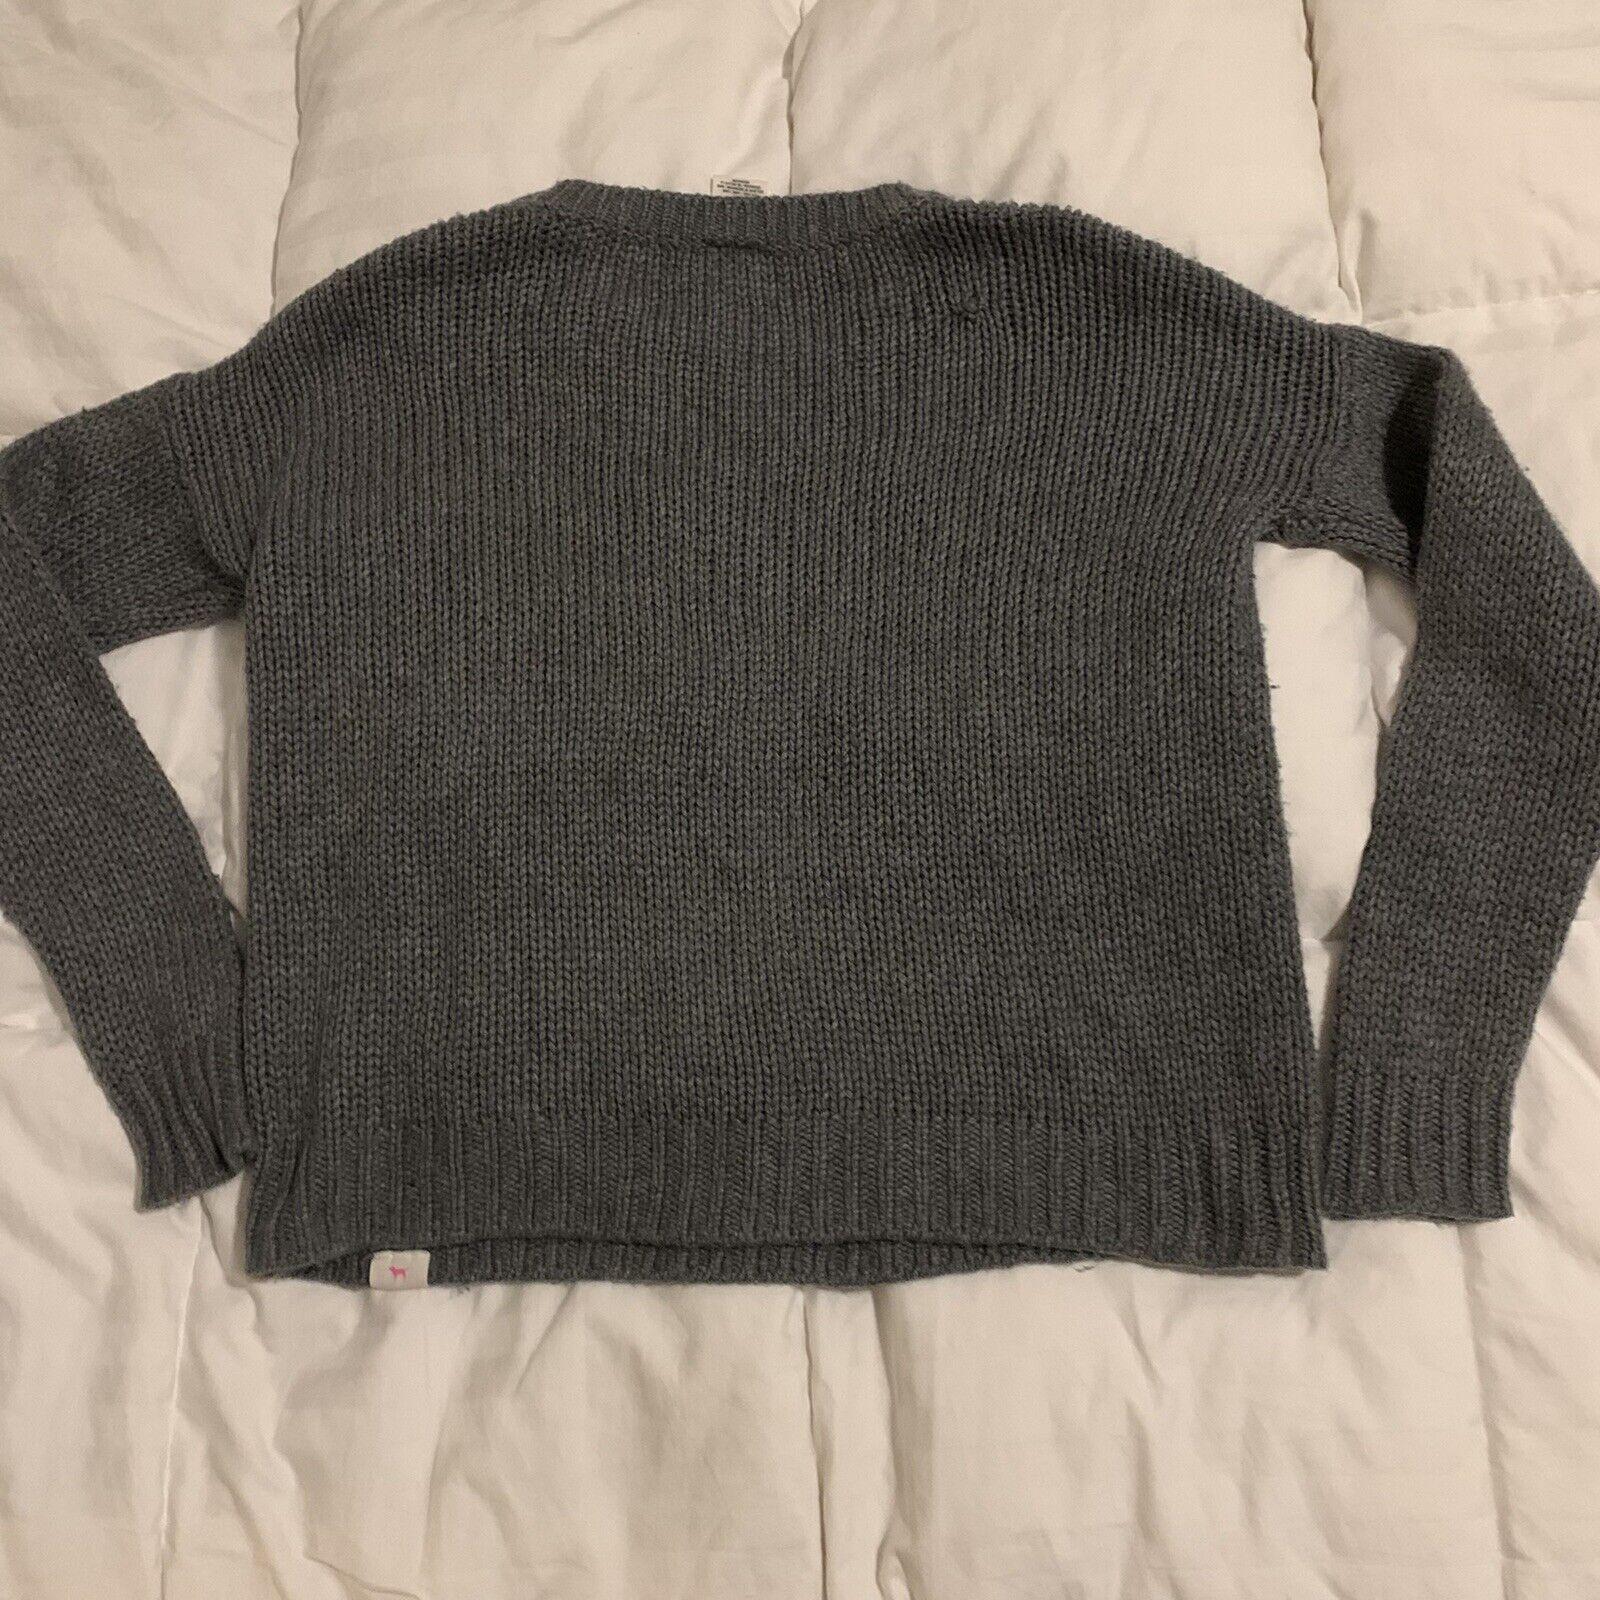 Victoria's Secret varsity letter gray sweater S - image 2